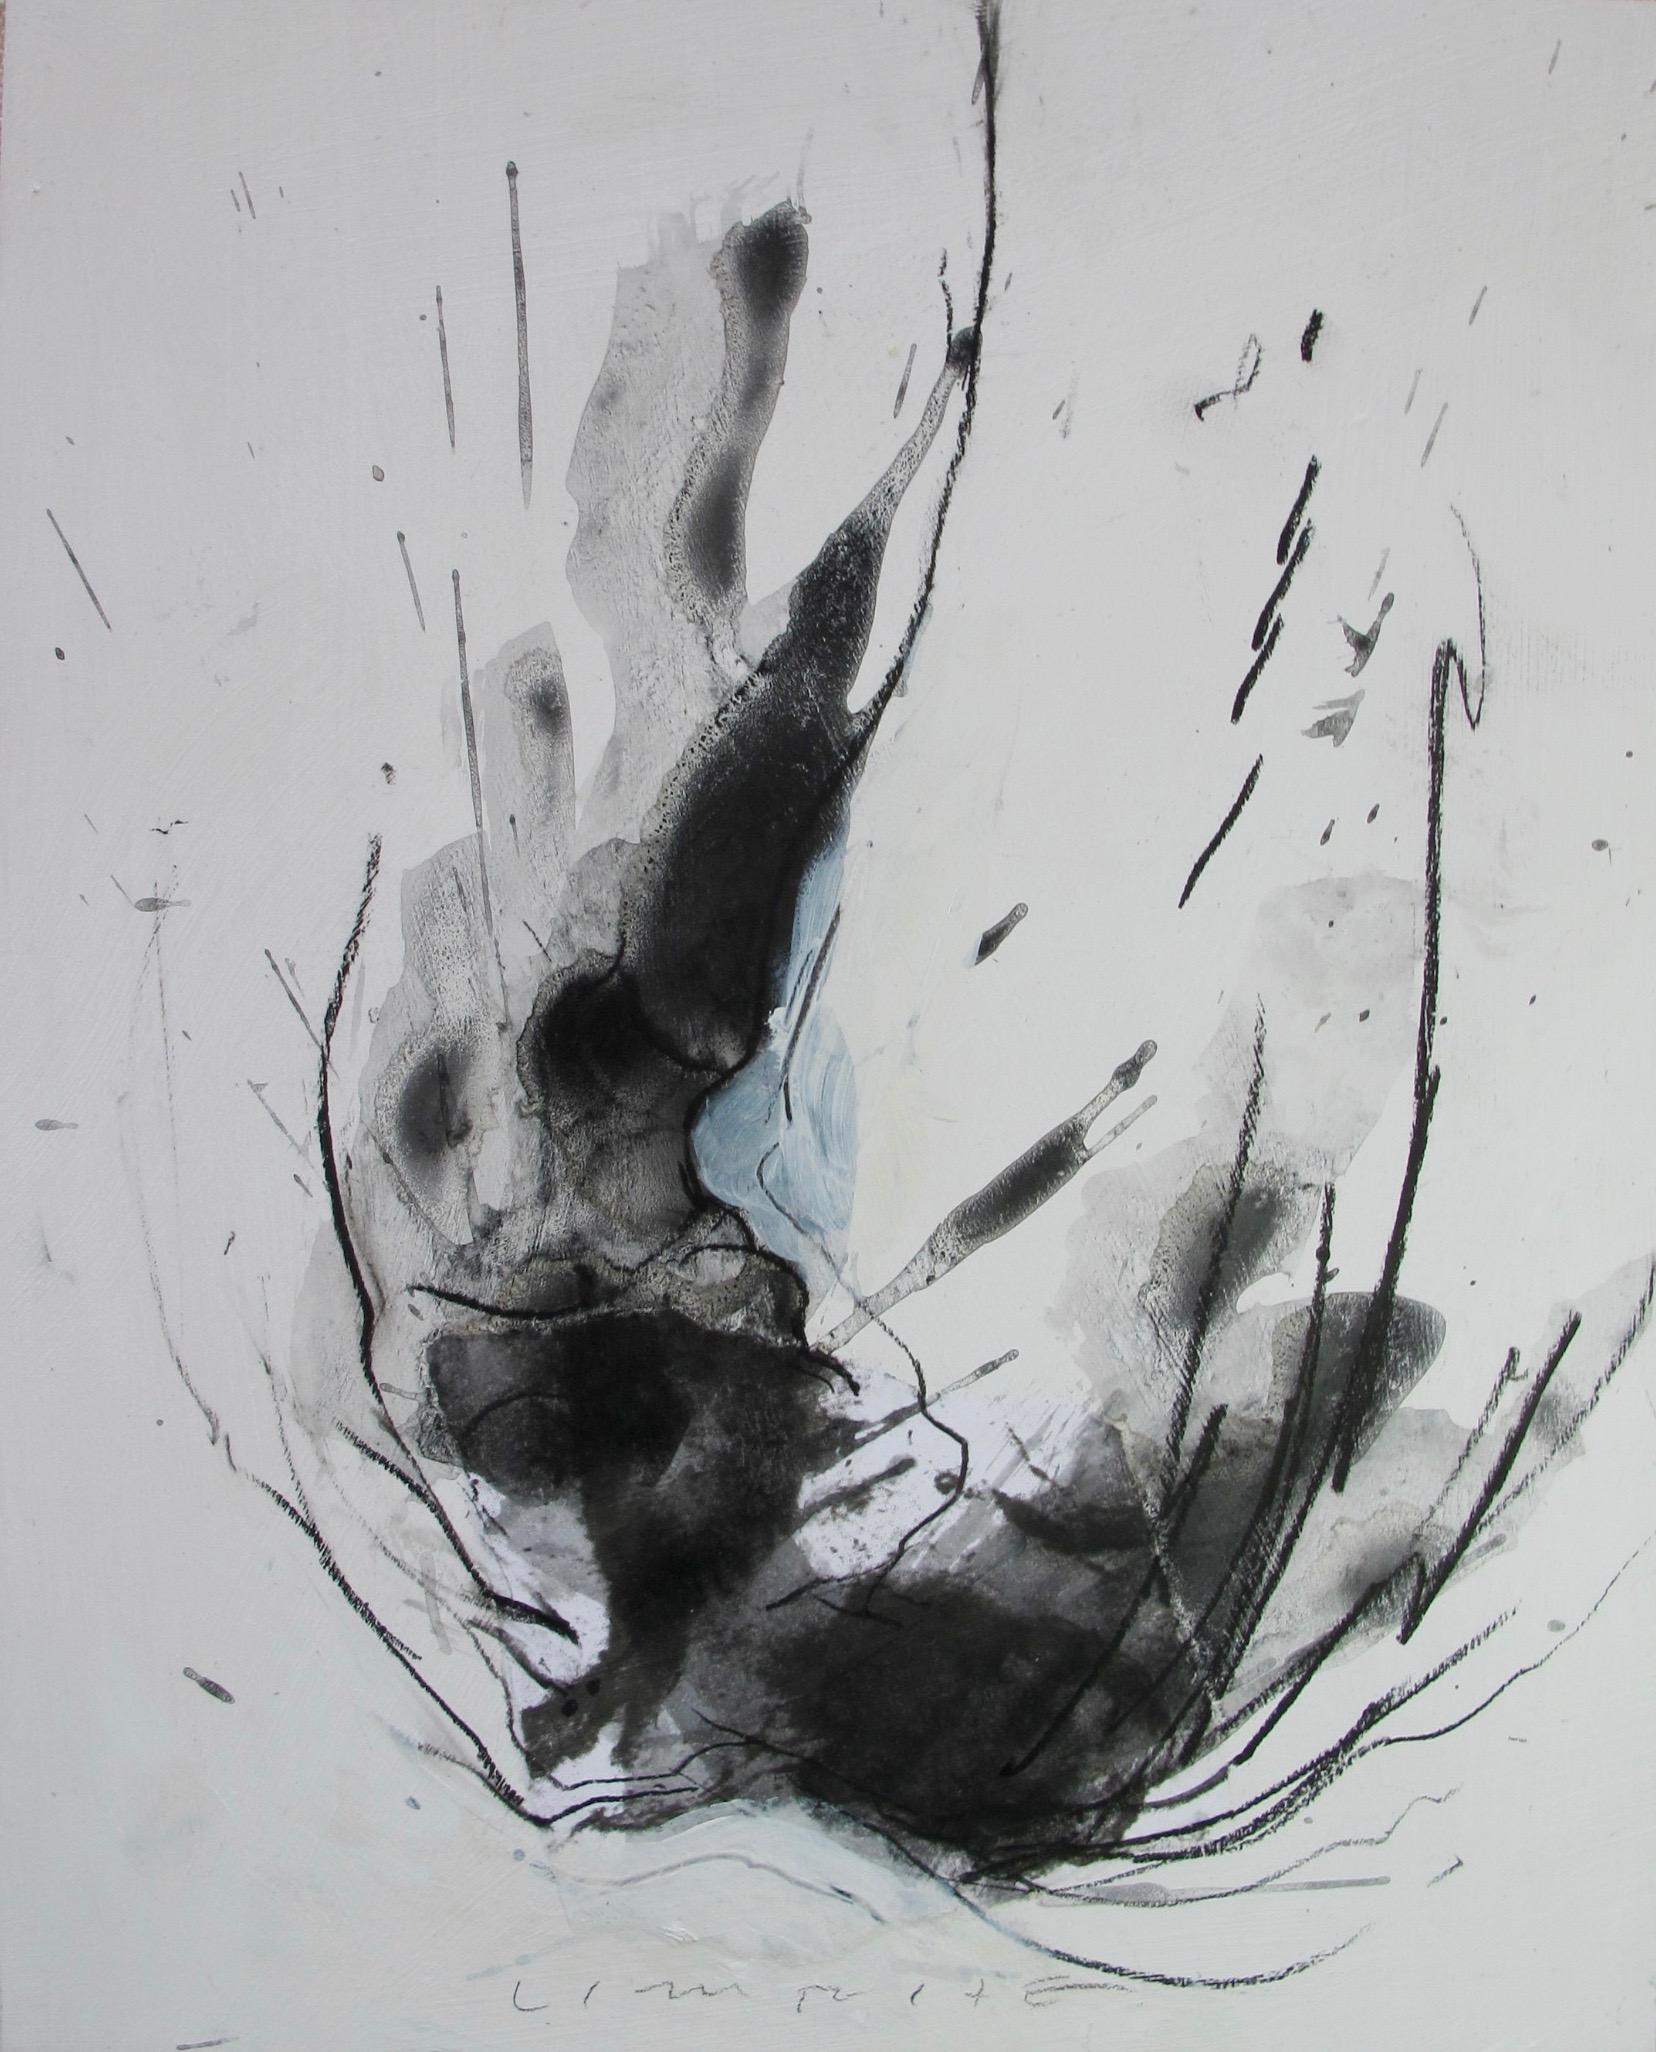 """Untitled"", 10""x 8"", mixed media on wood, Copyright 2016 David Limrite"